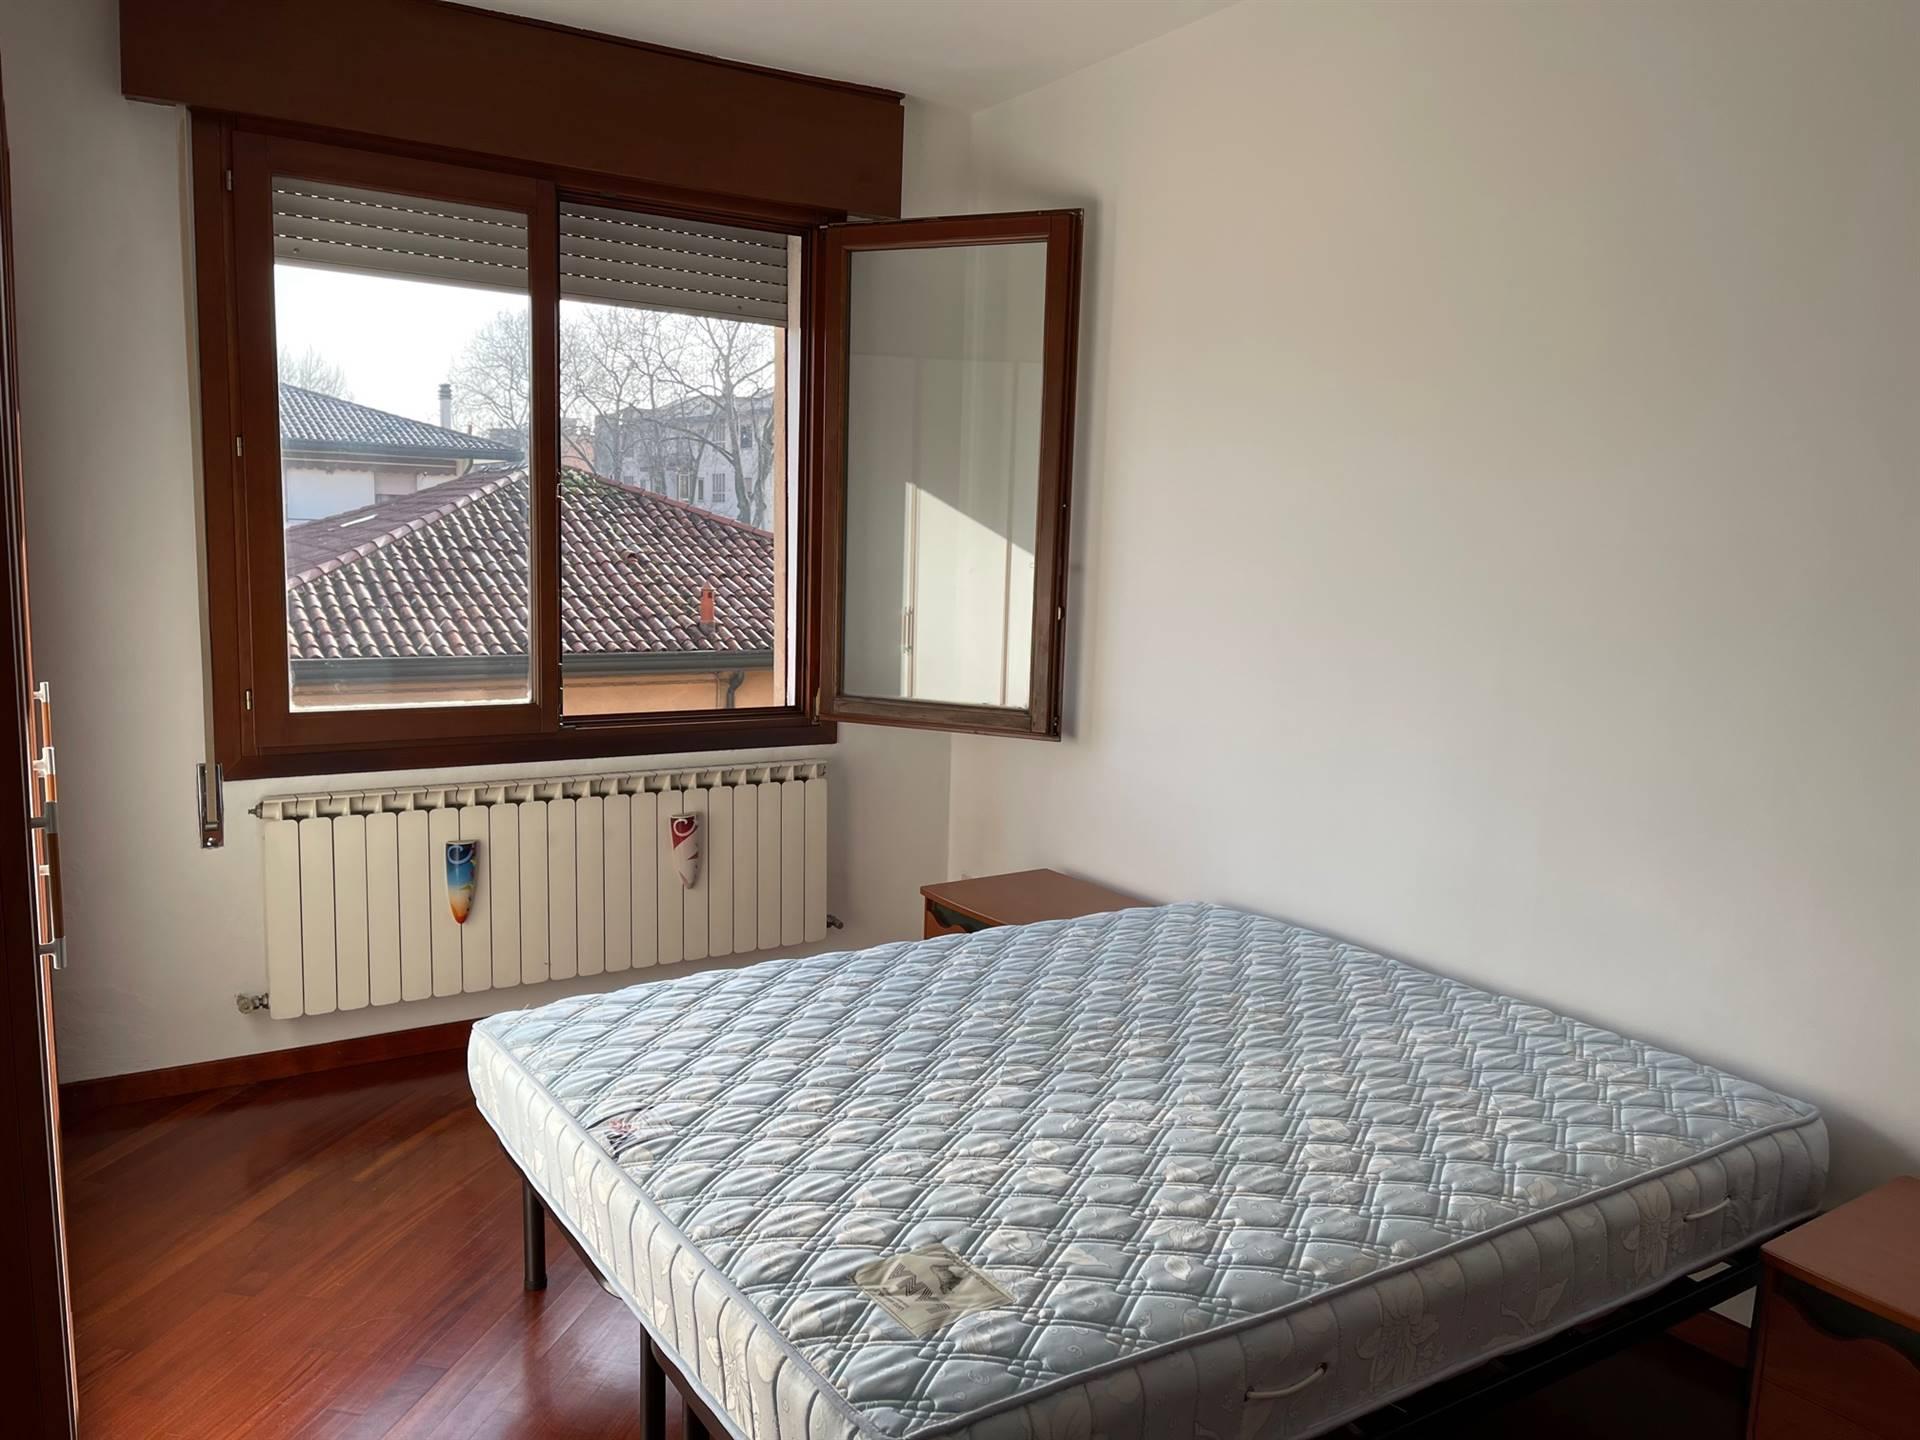 camera appartamento arredato Mestre vendita